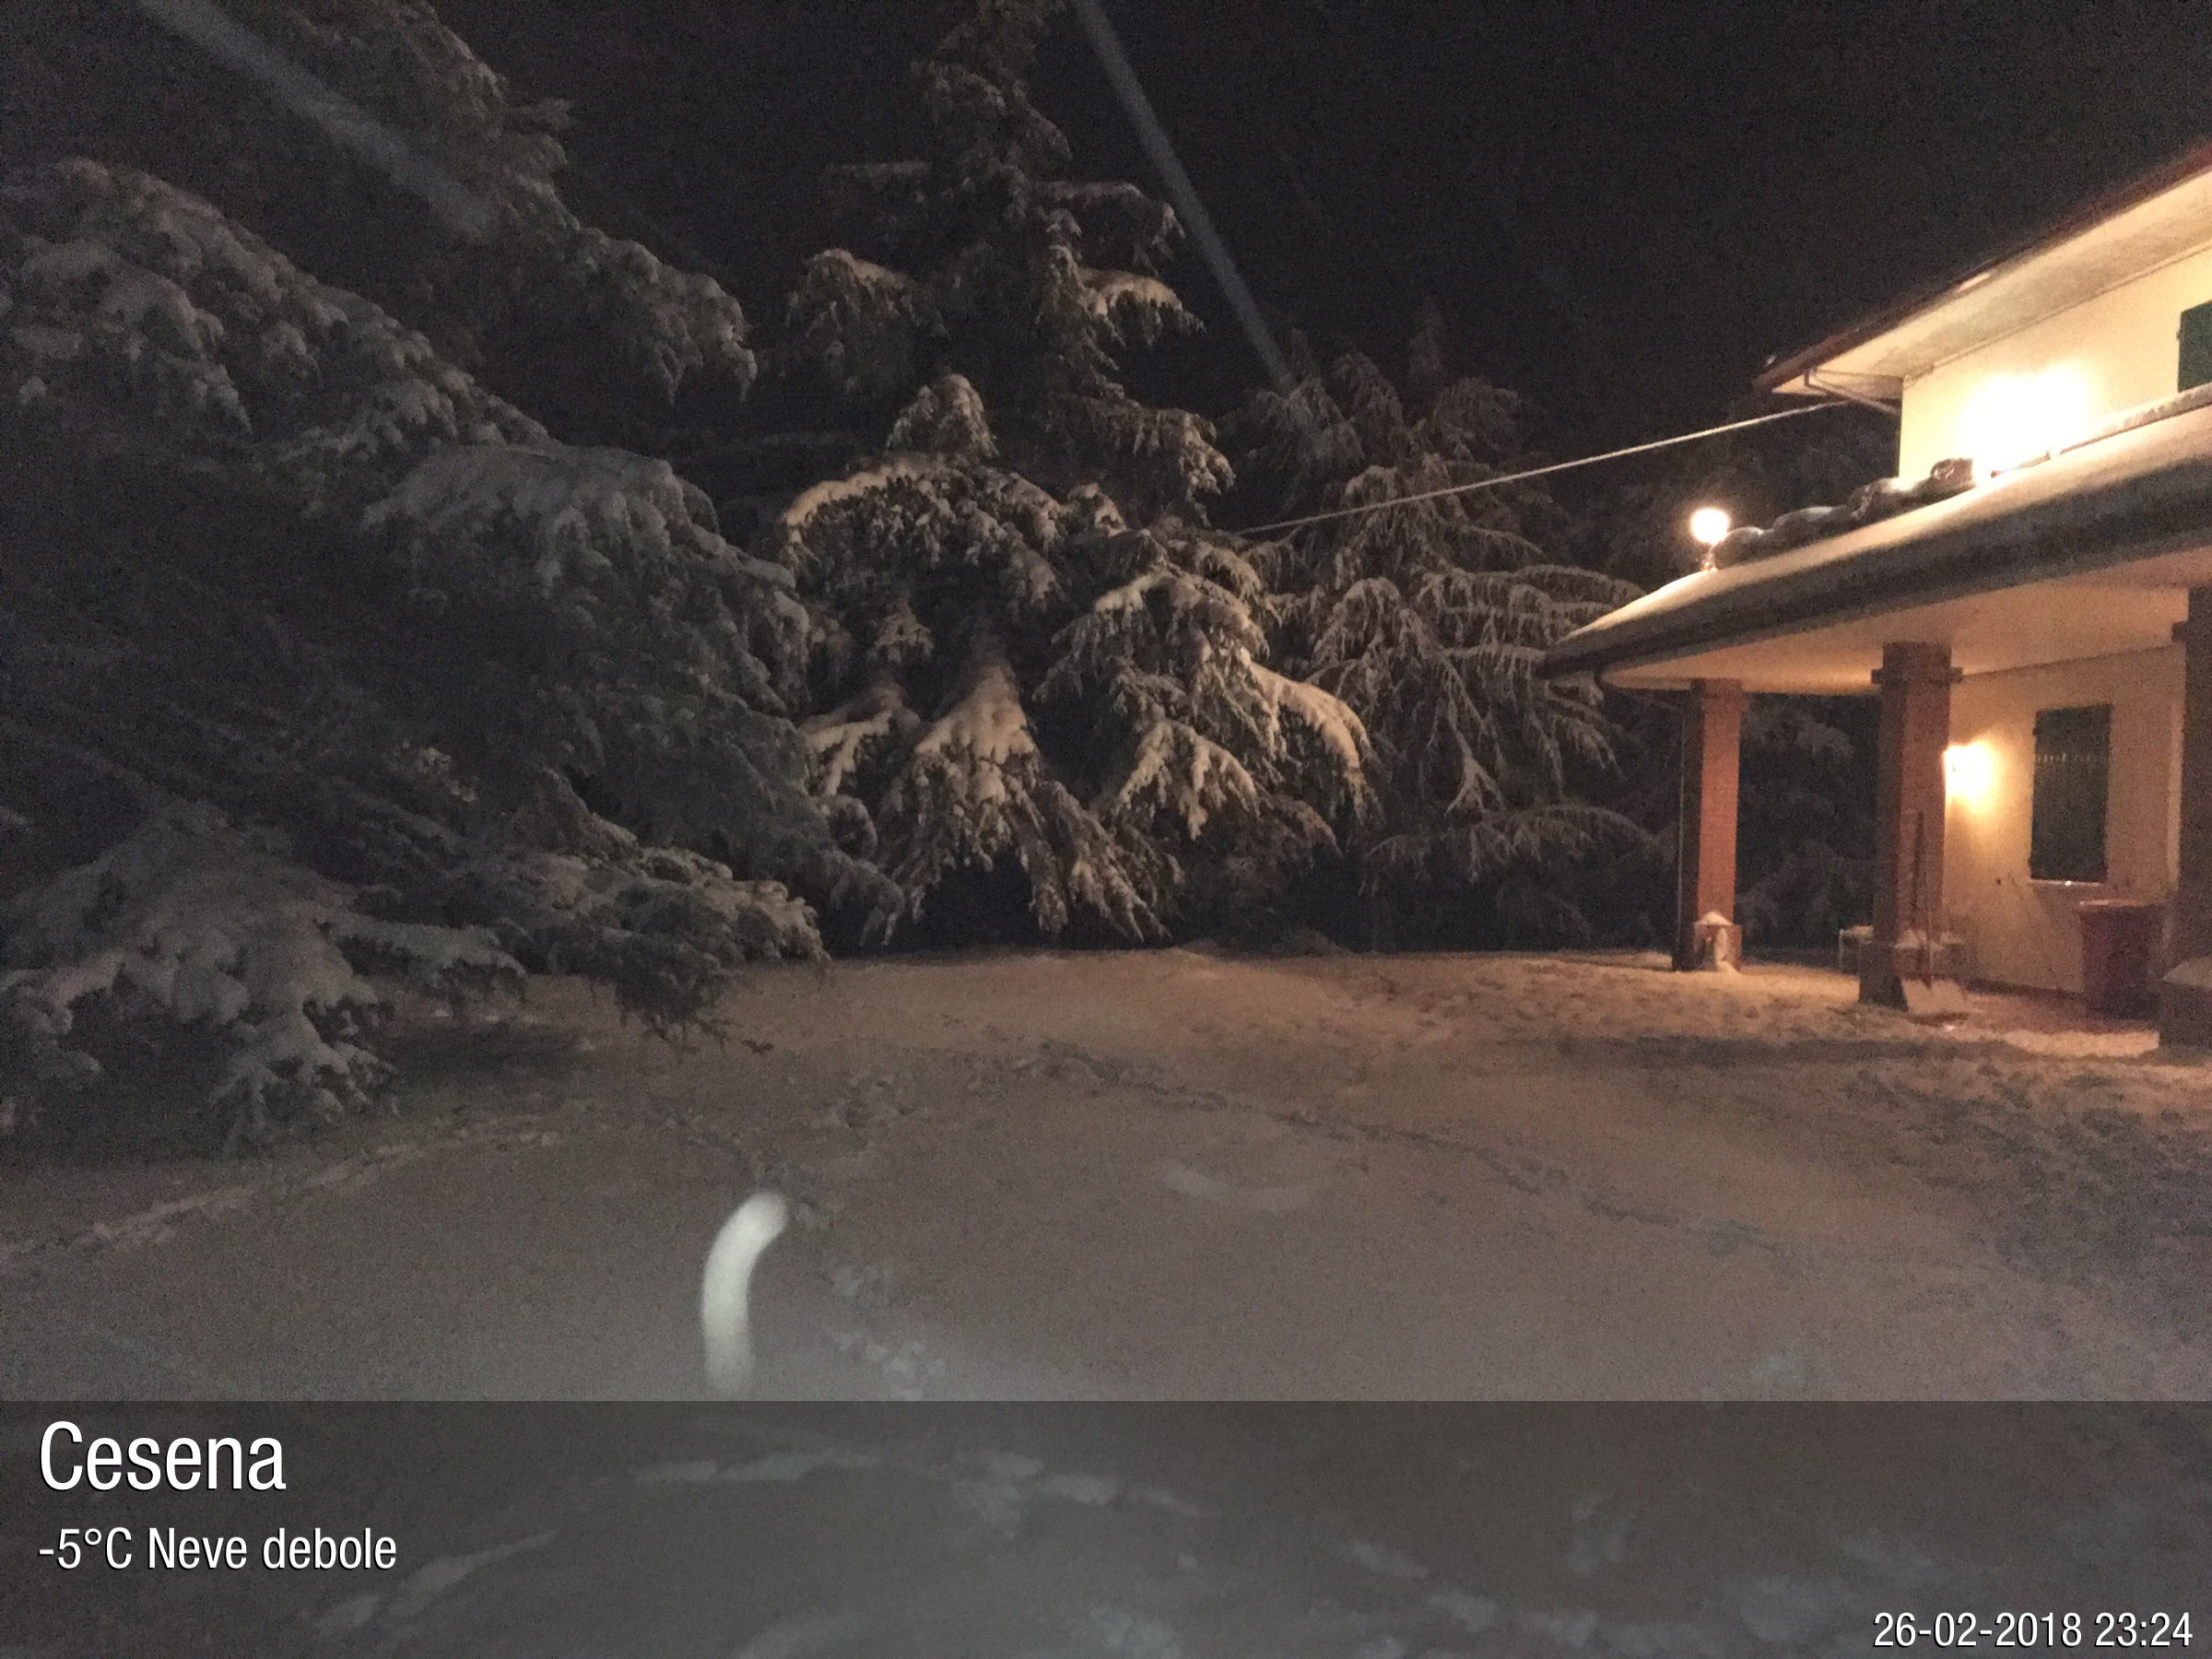 Foto meteo - Cesena - Cesena ore 23:24 » ILMETEO.it